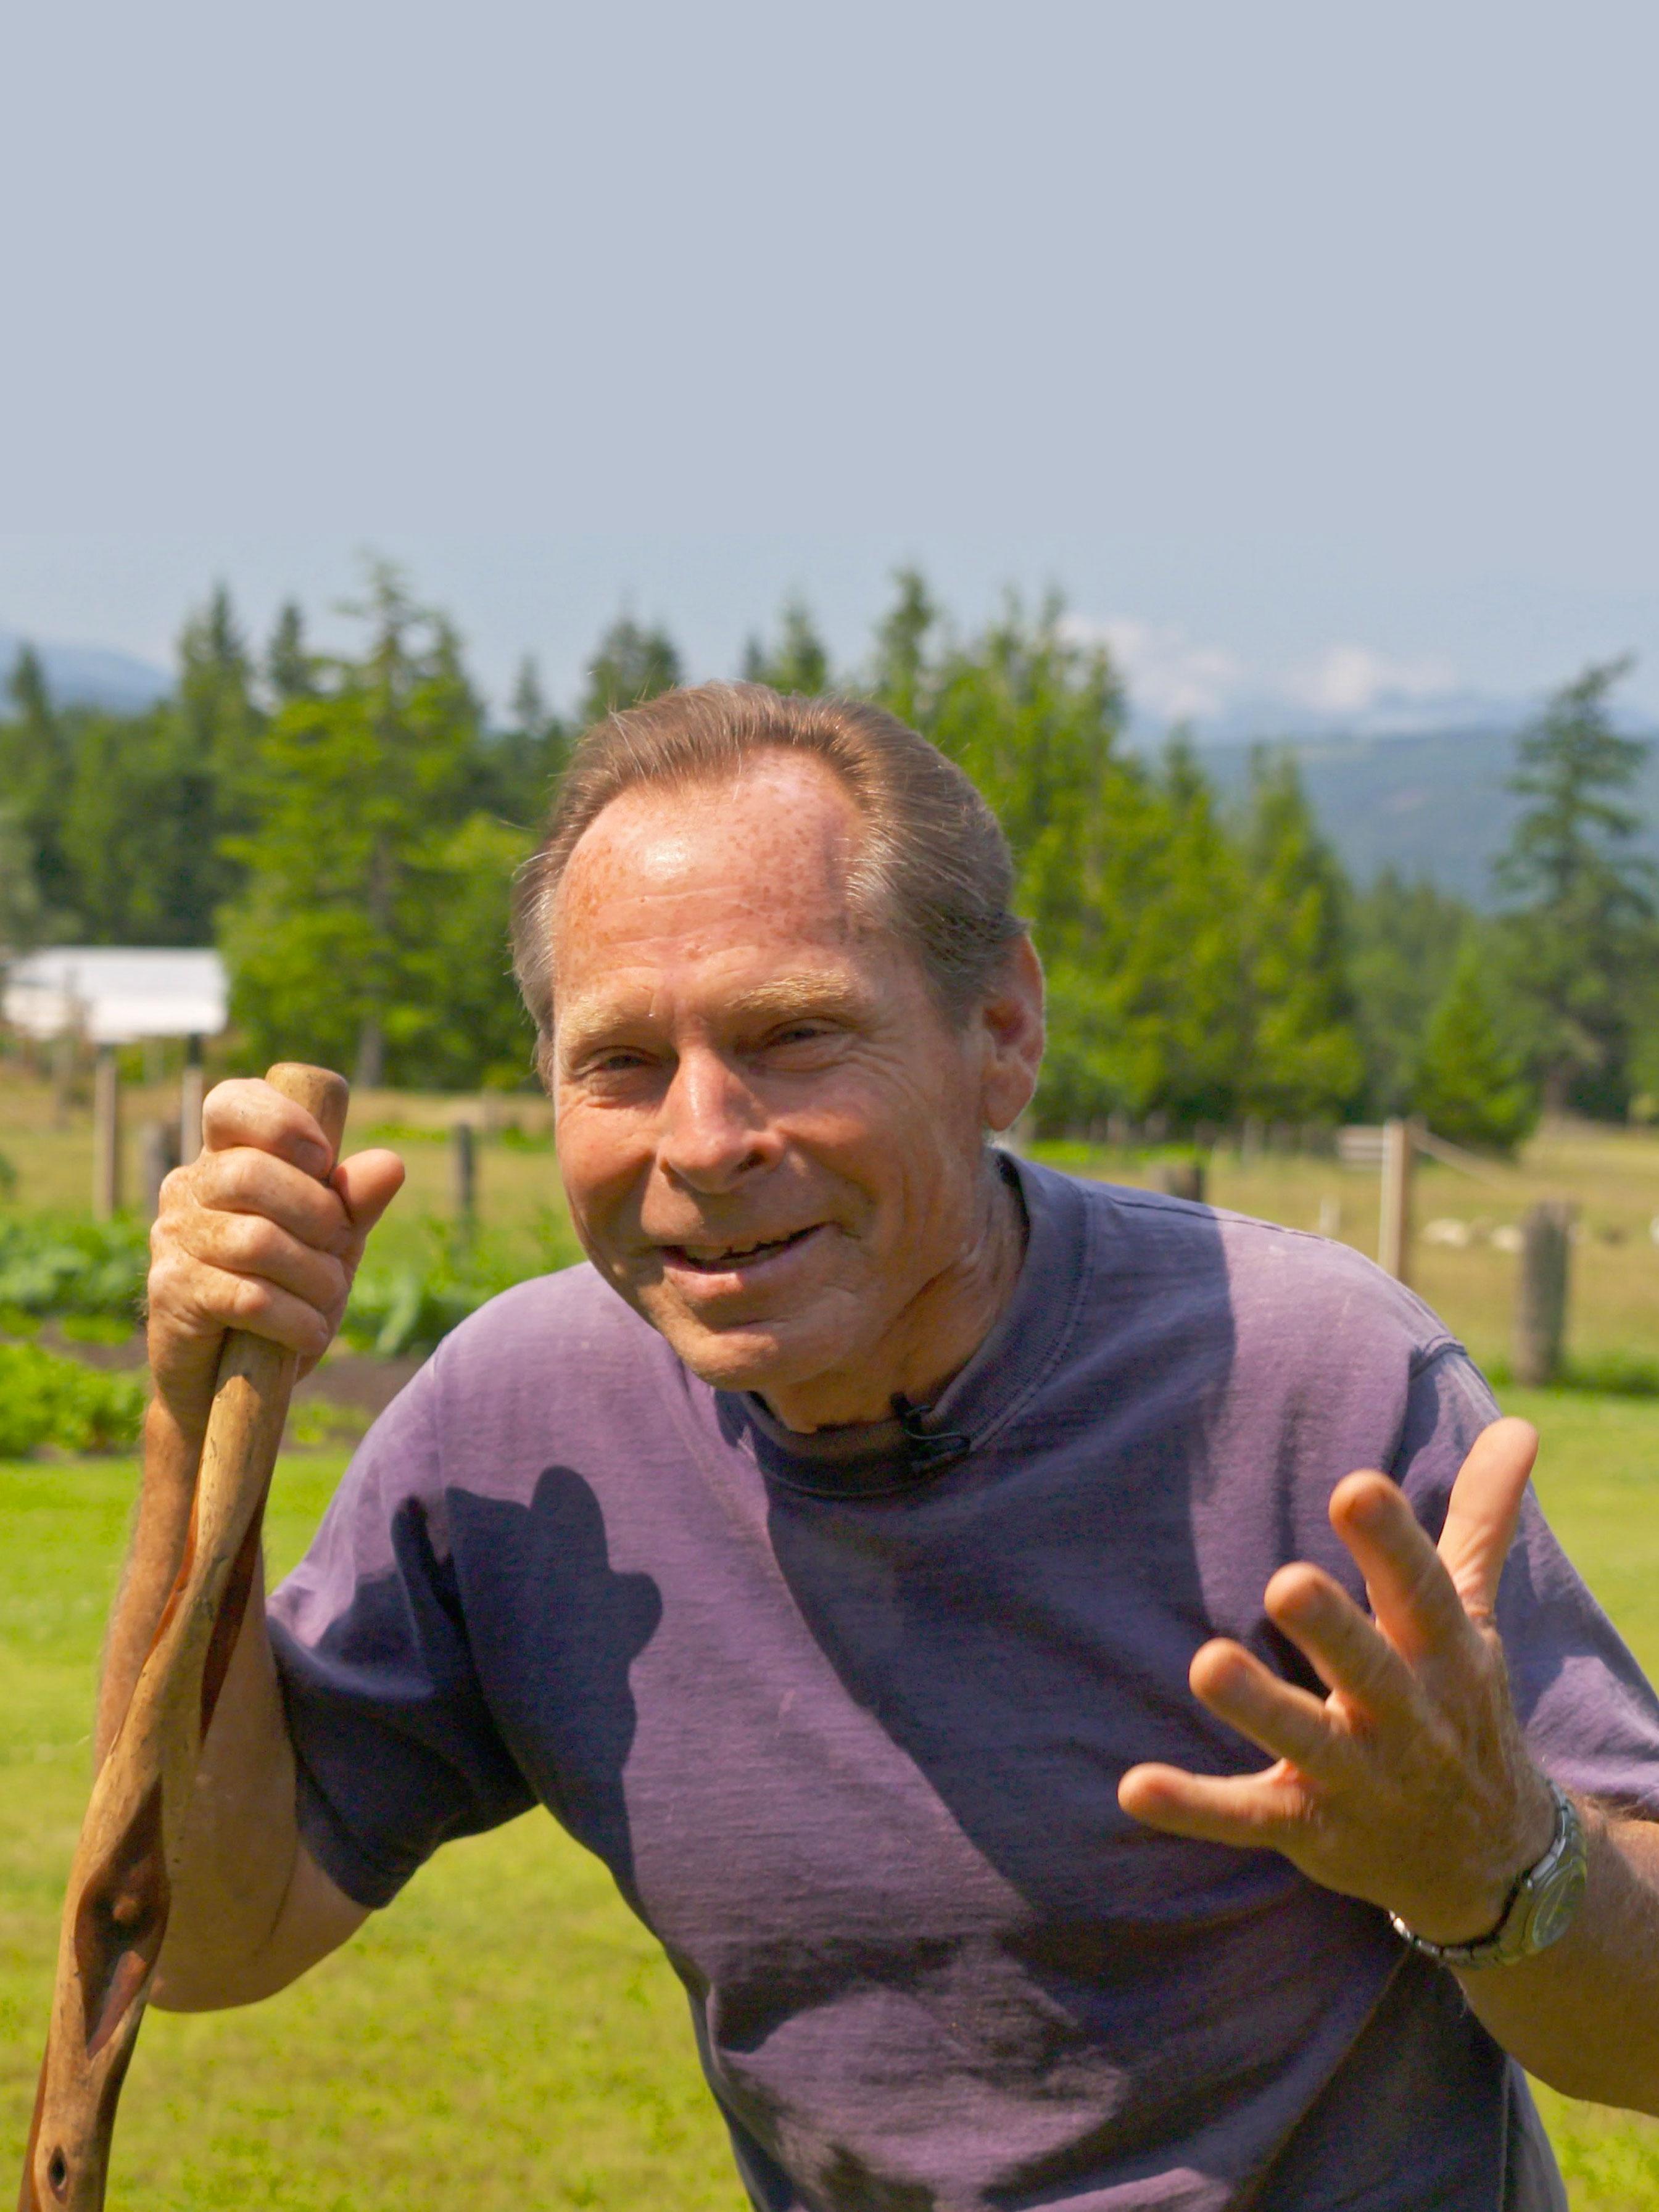 Paul Gautschi